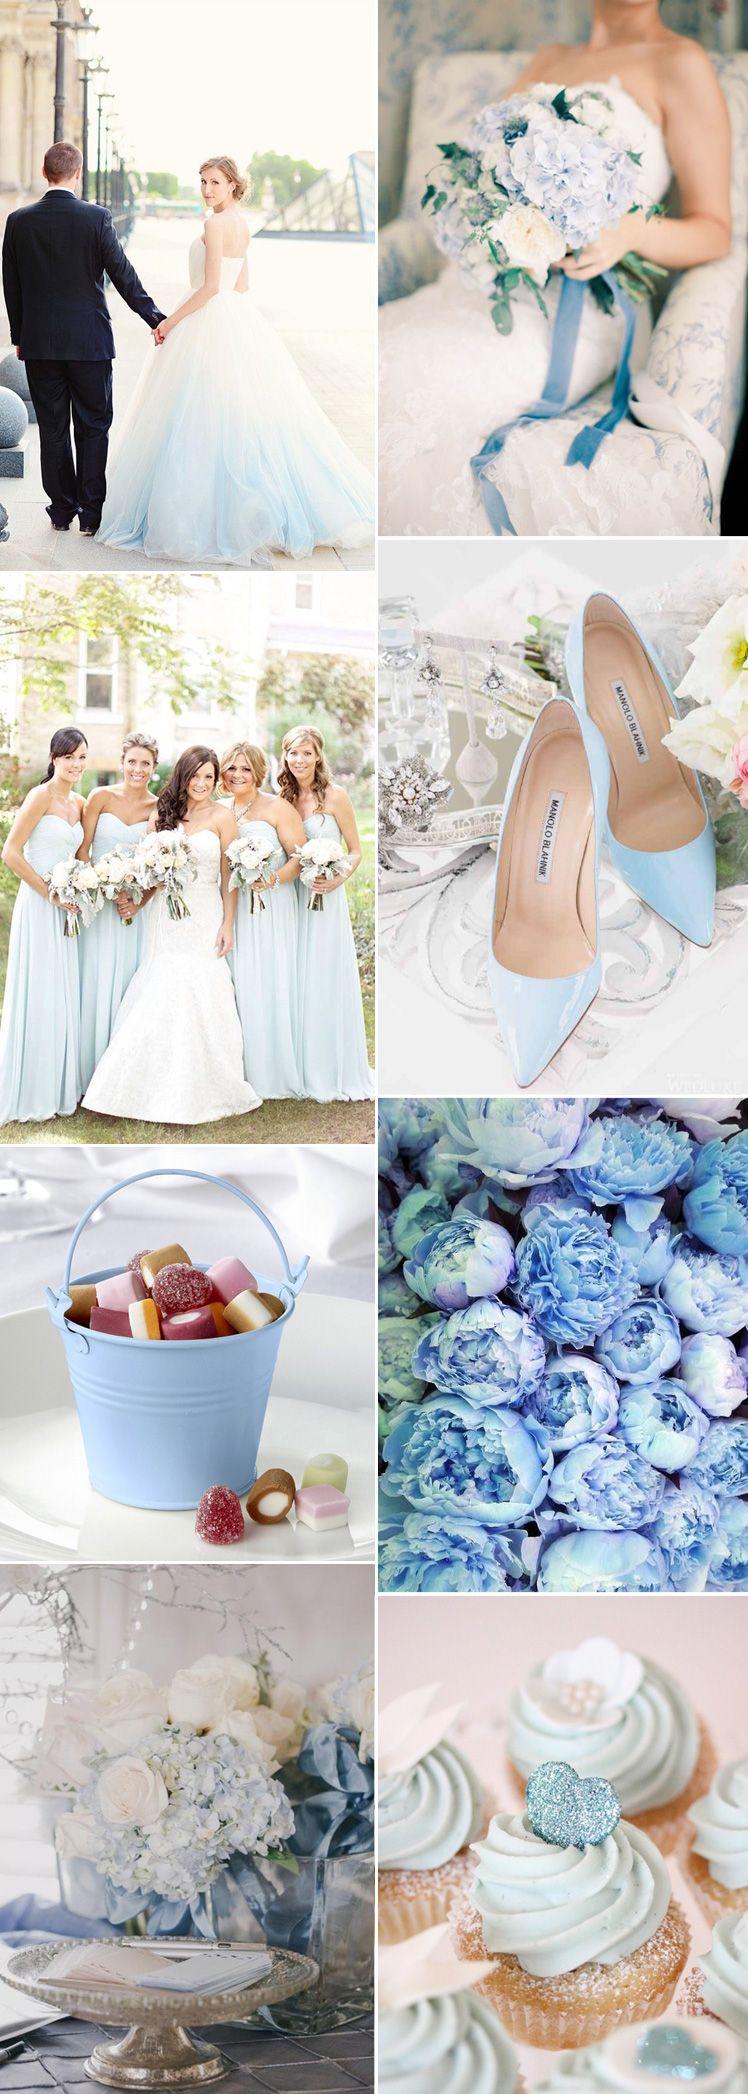 inspiring ideas for a pastel blue wedding